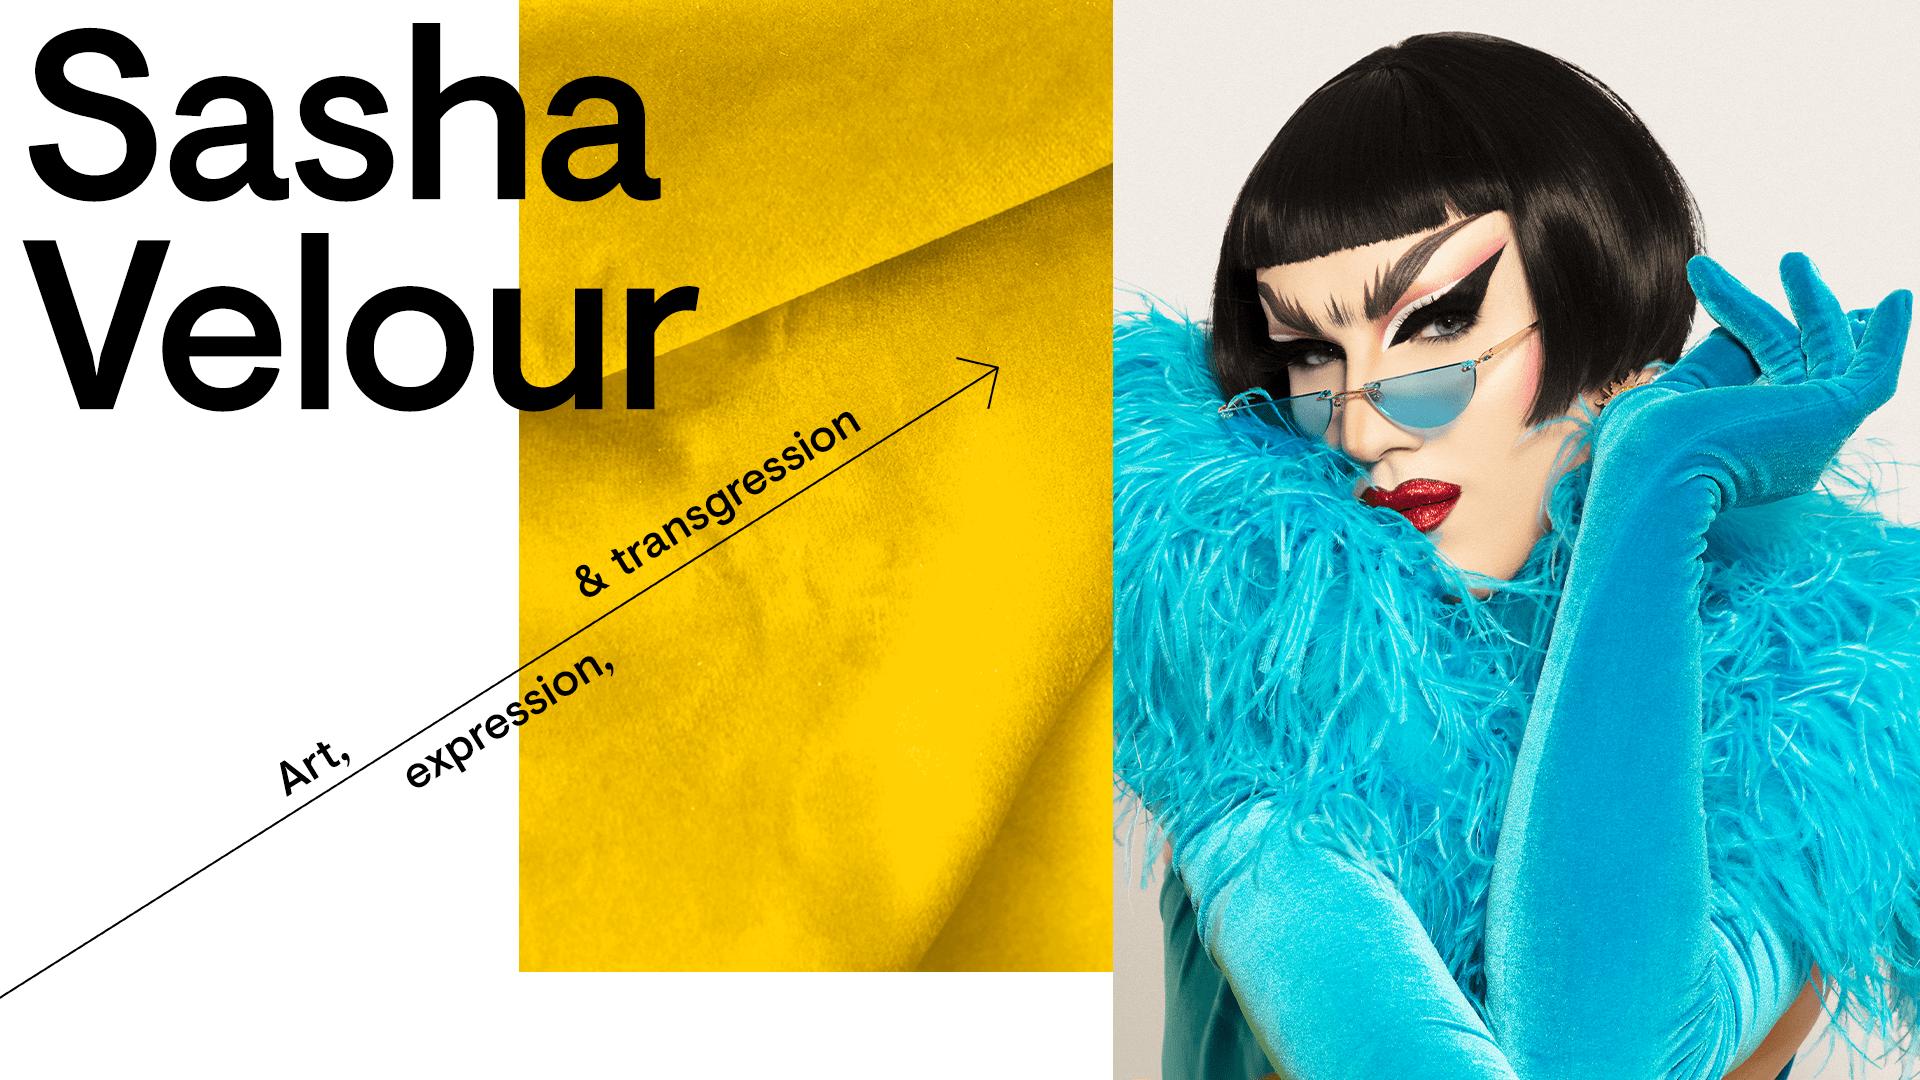 Sasha Velour - Art, Expression and Transgression